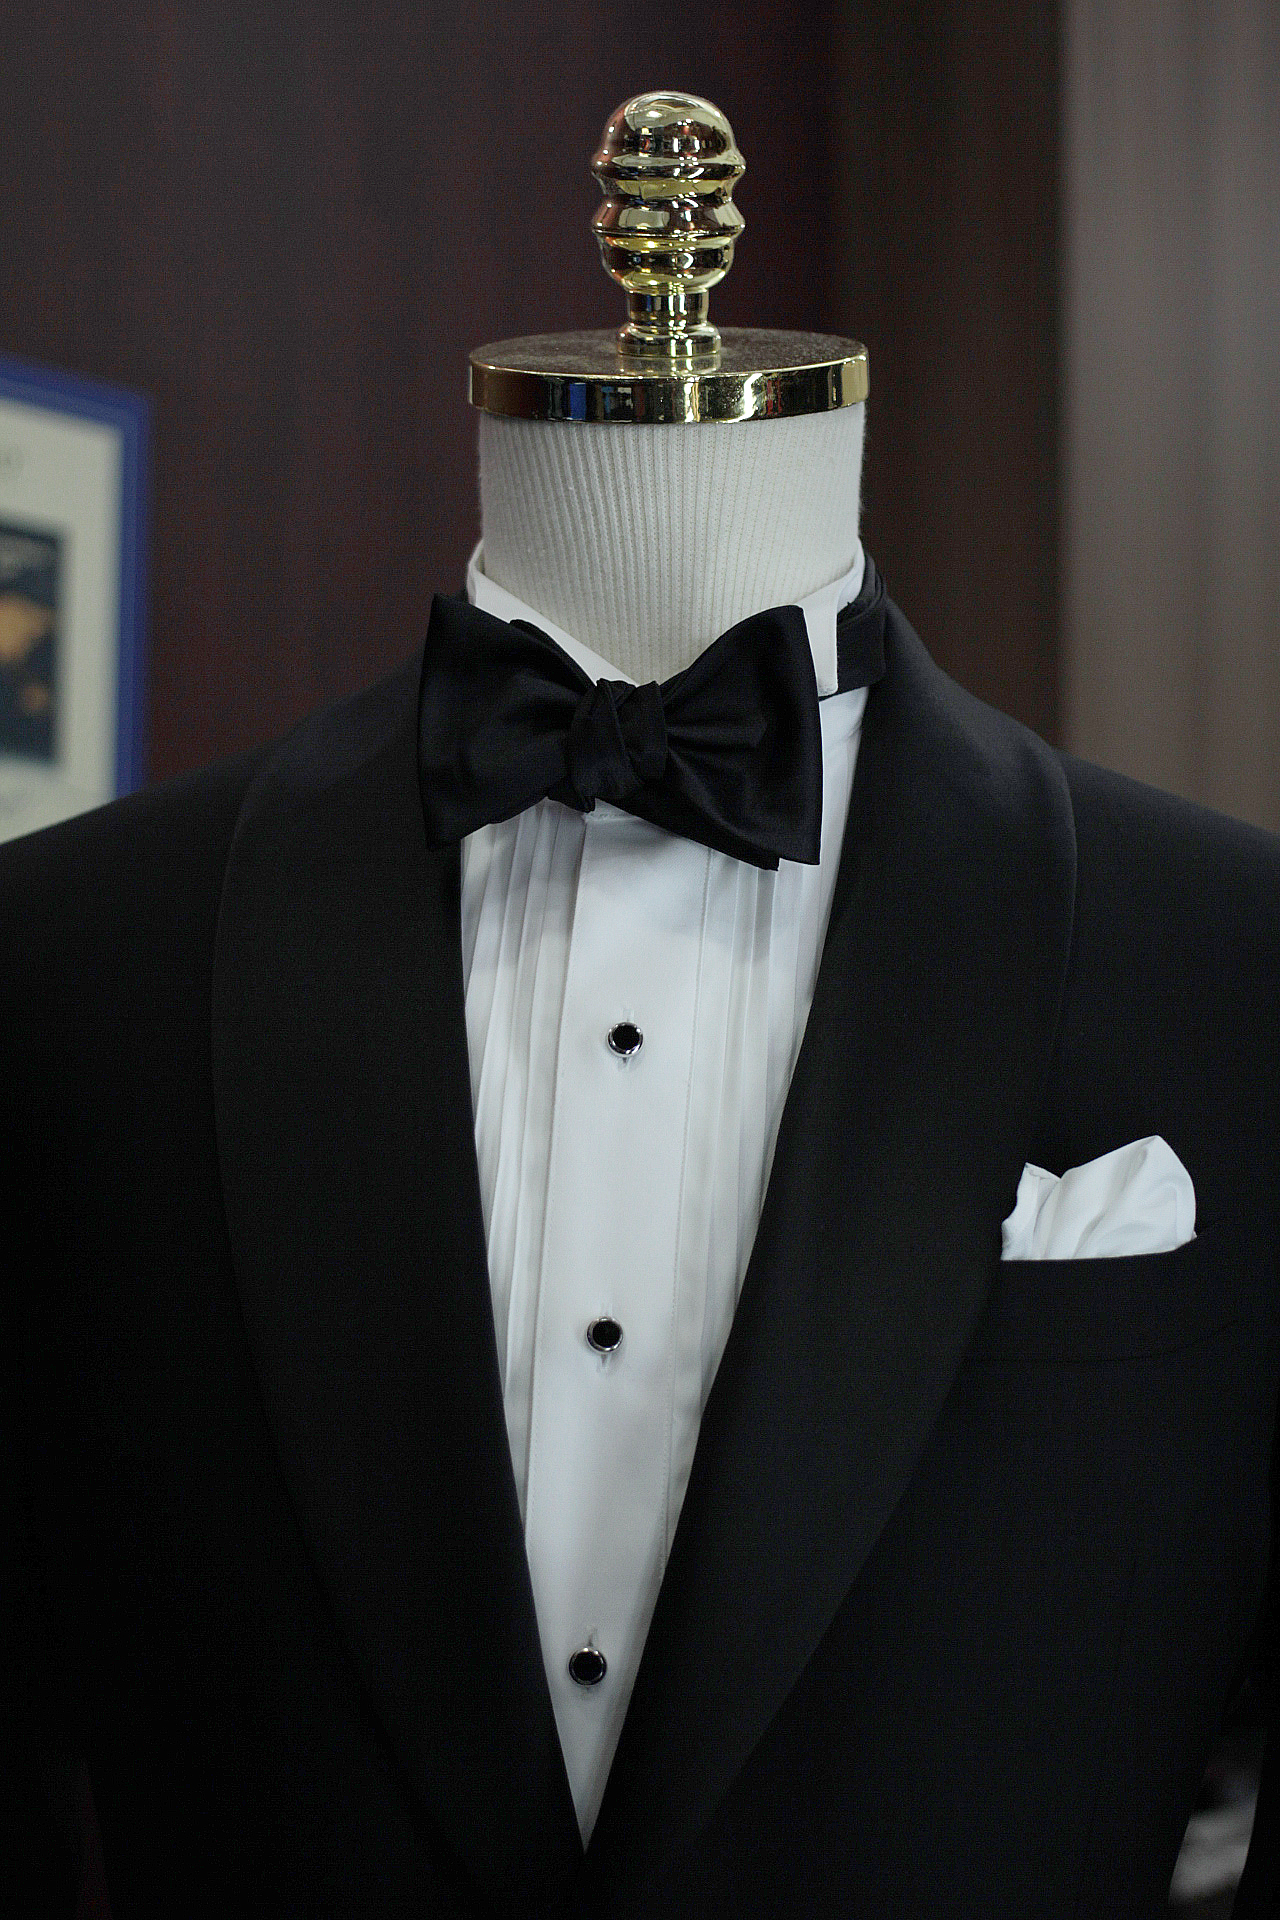 Skyfall Tuxedo Made Suits Tailored Bespoke Tuxedo Singapore inner lining bowtie filarte.JPG